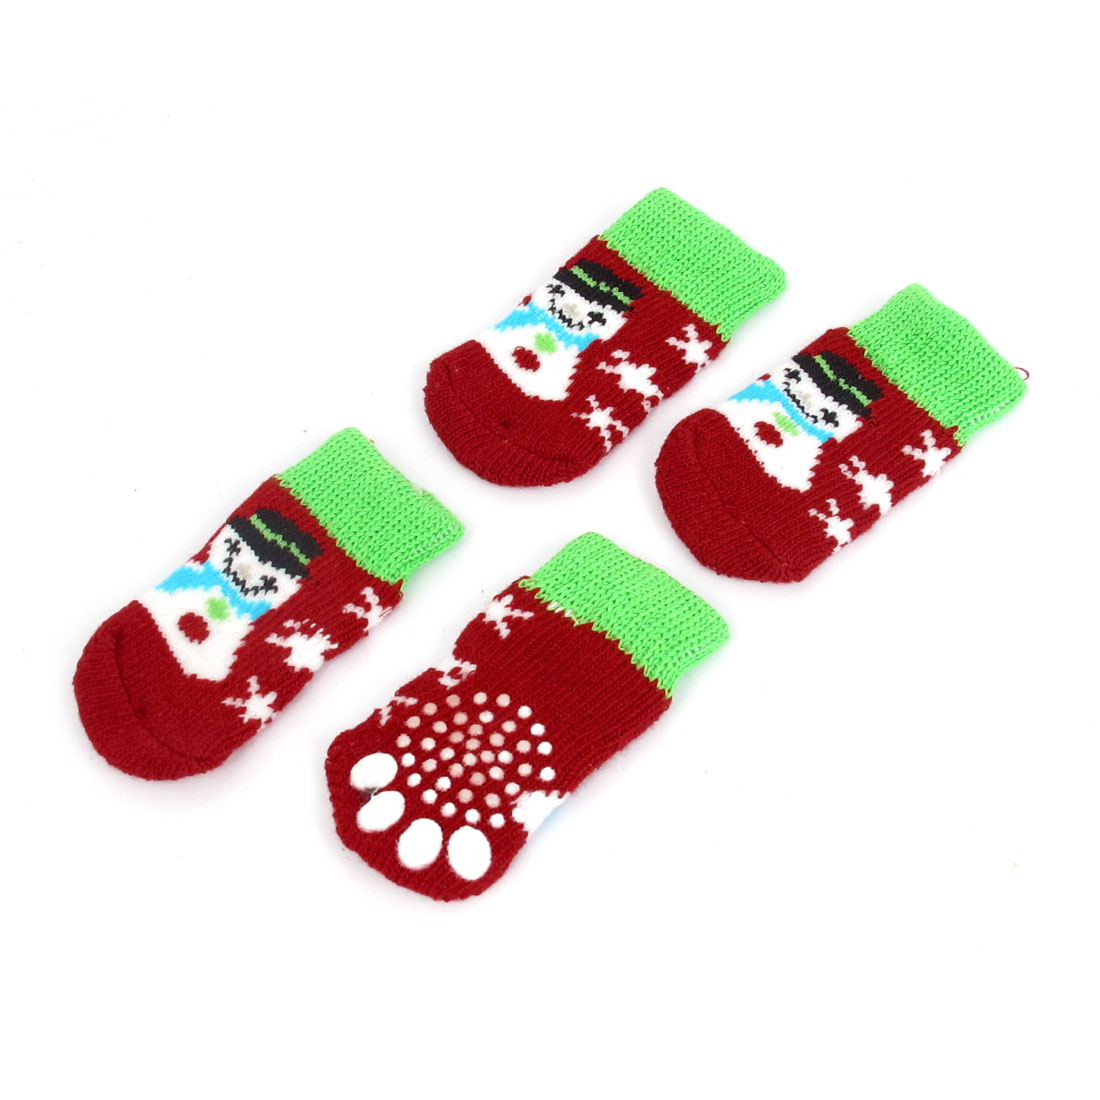 2 Pairs Snowman Printed Nonskid Bottom Elastic Cuff Knitted Pet Dog Yorkie Cat Socks